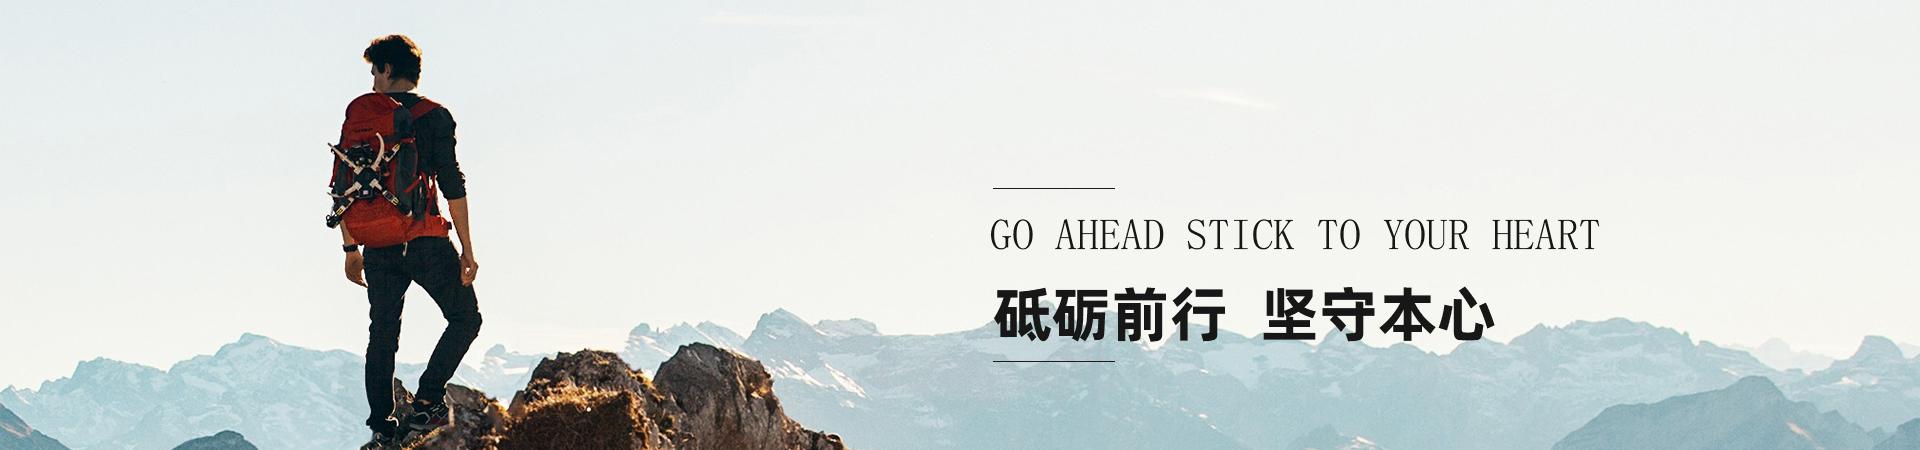 http://www.lzyshb.cn/data/upload/202007/20200725085721_708.jpg